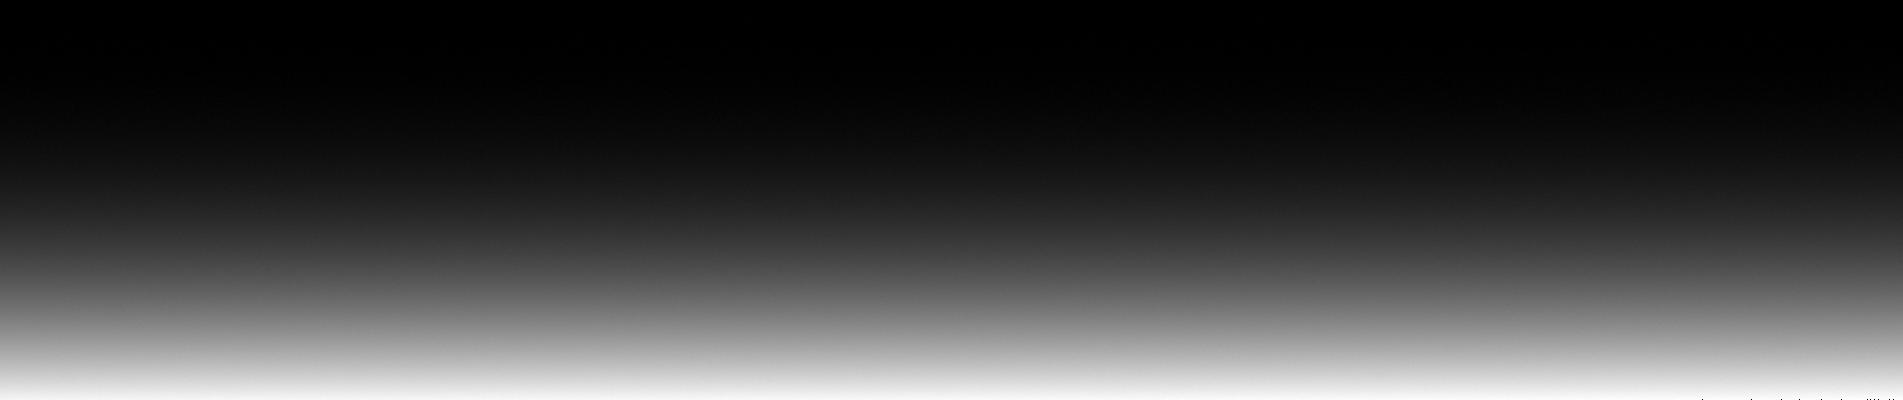 Gradient Background Image